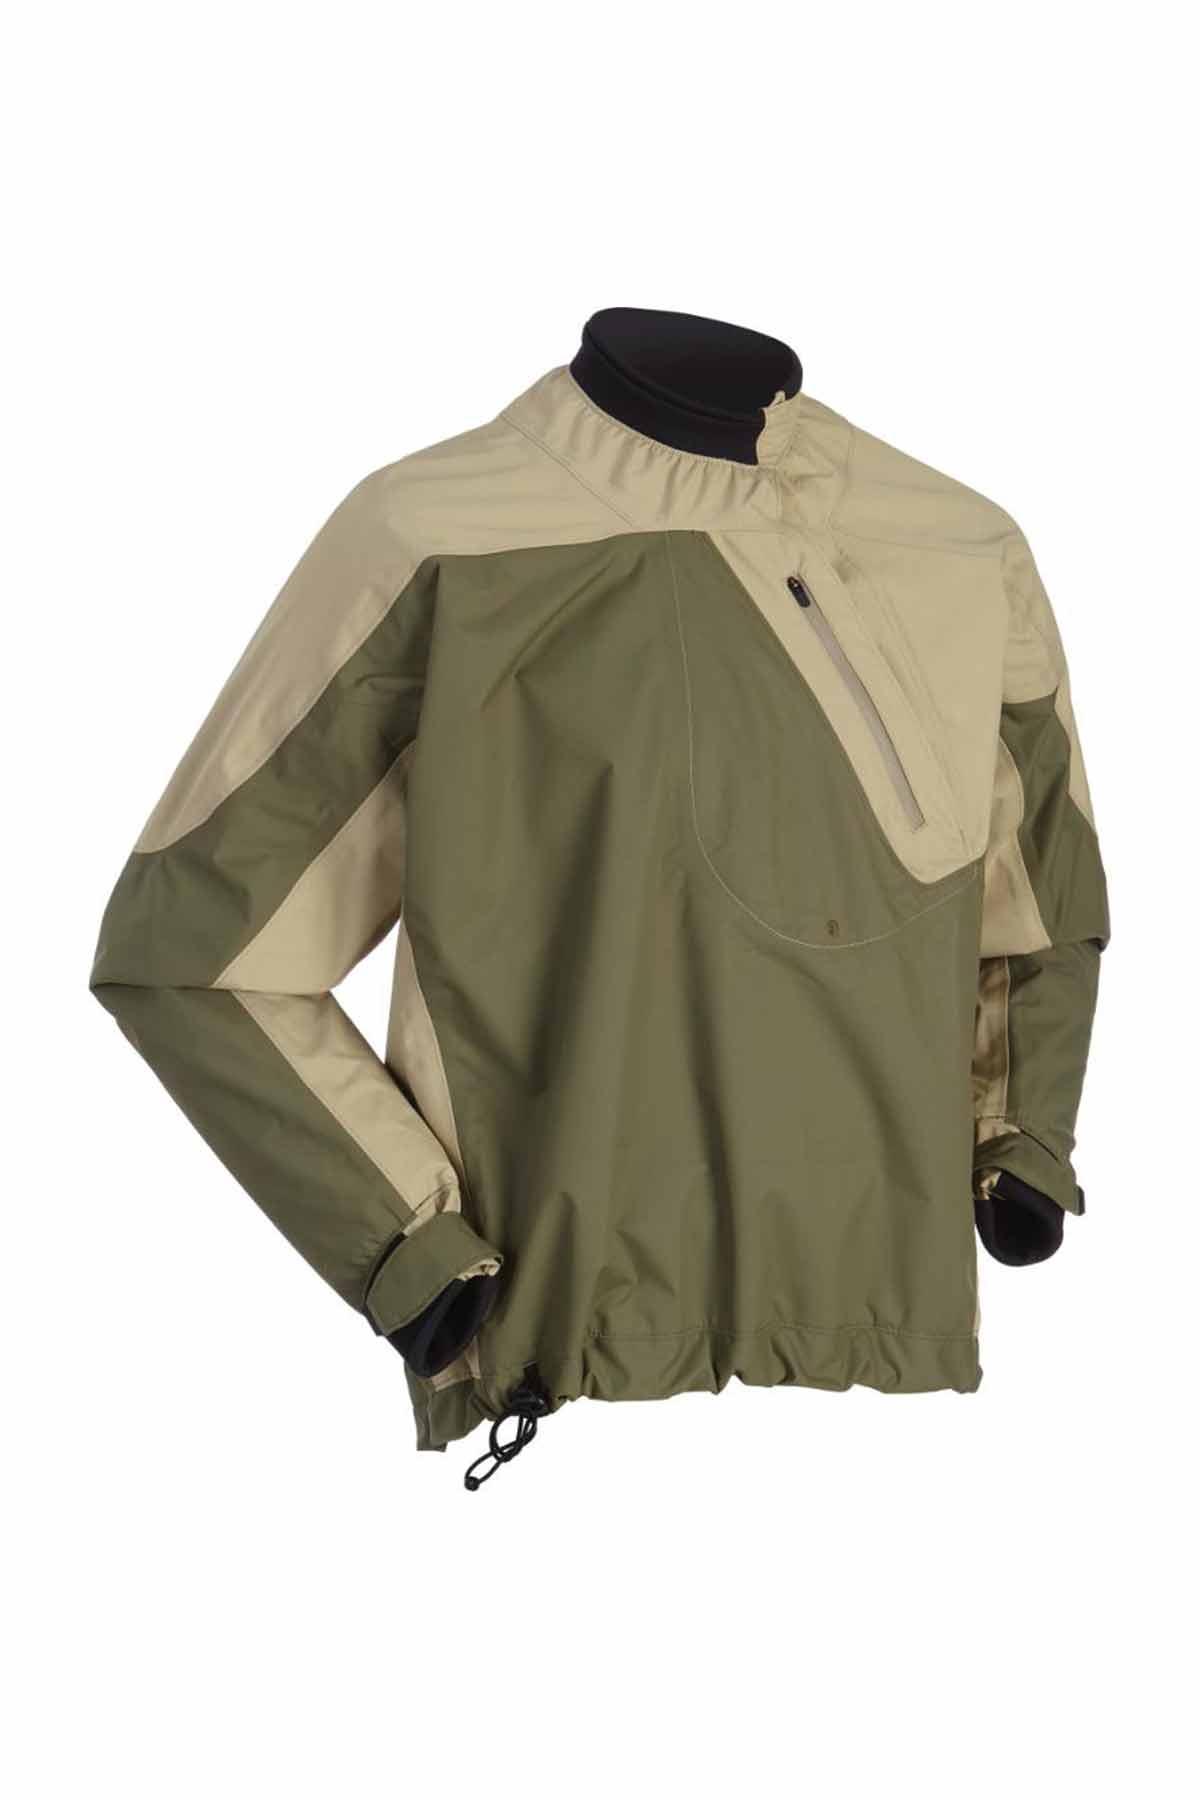 Immersion Research Zephyr Splash Jacket Winter Moss